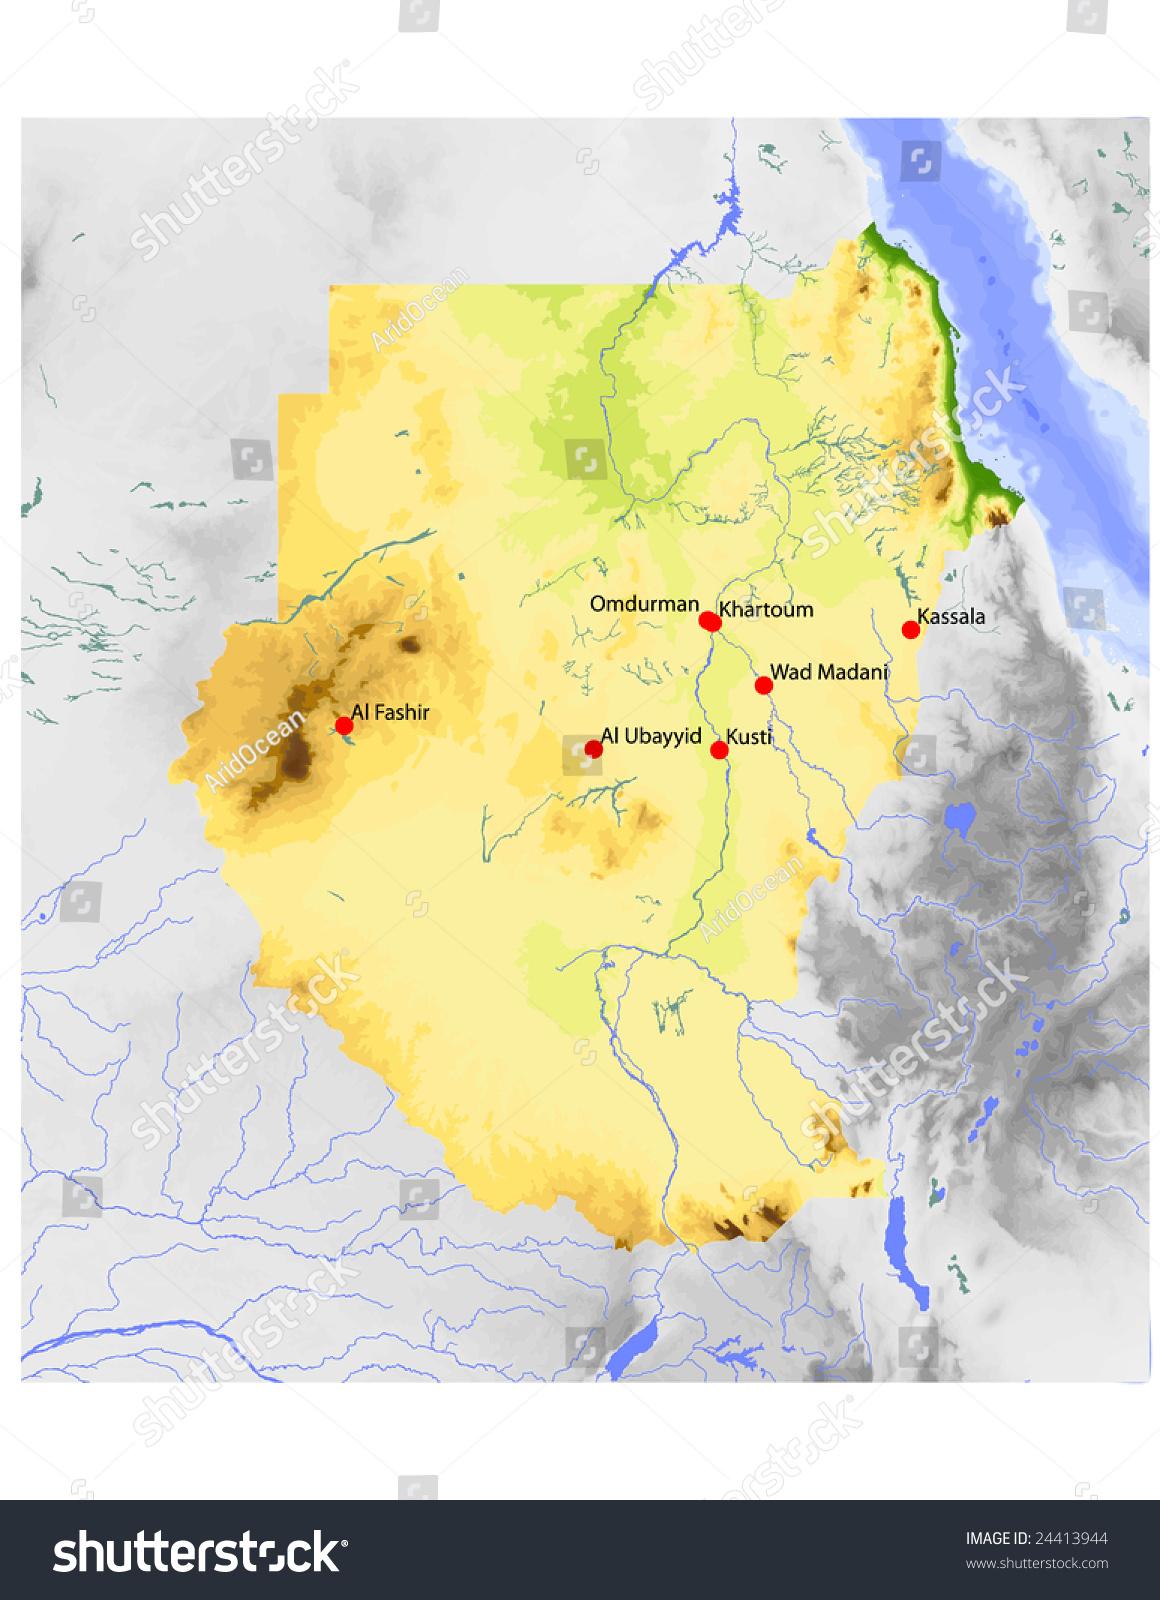 Sudan Physical Vector Map Colored According Stock Vector - Wad madani map